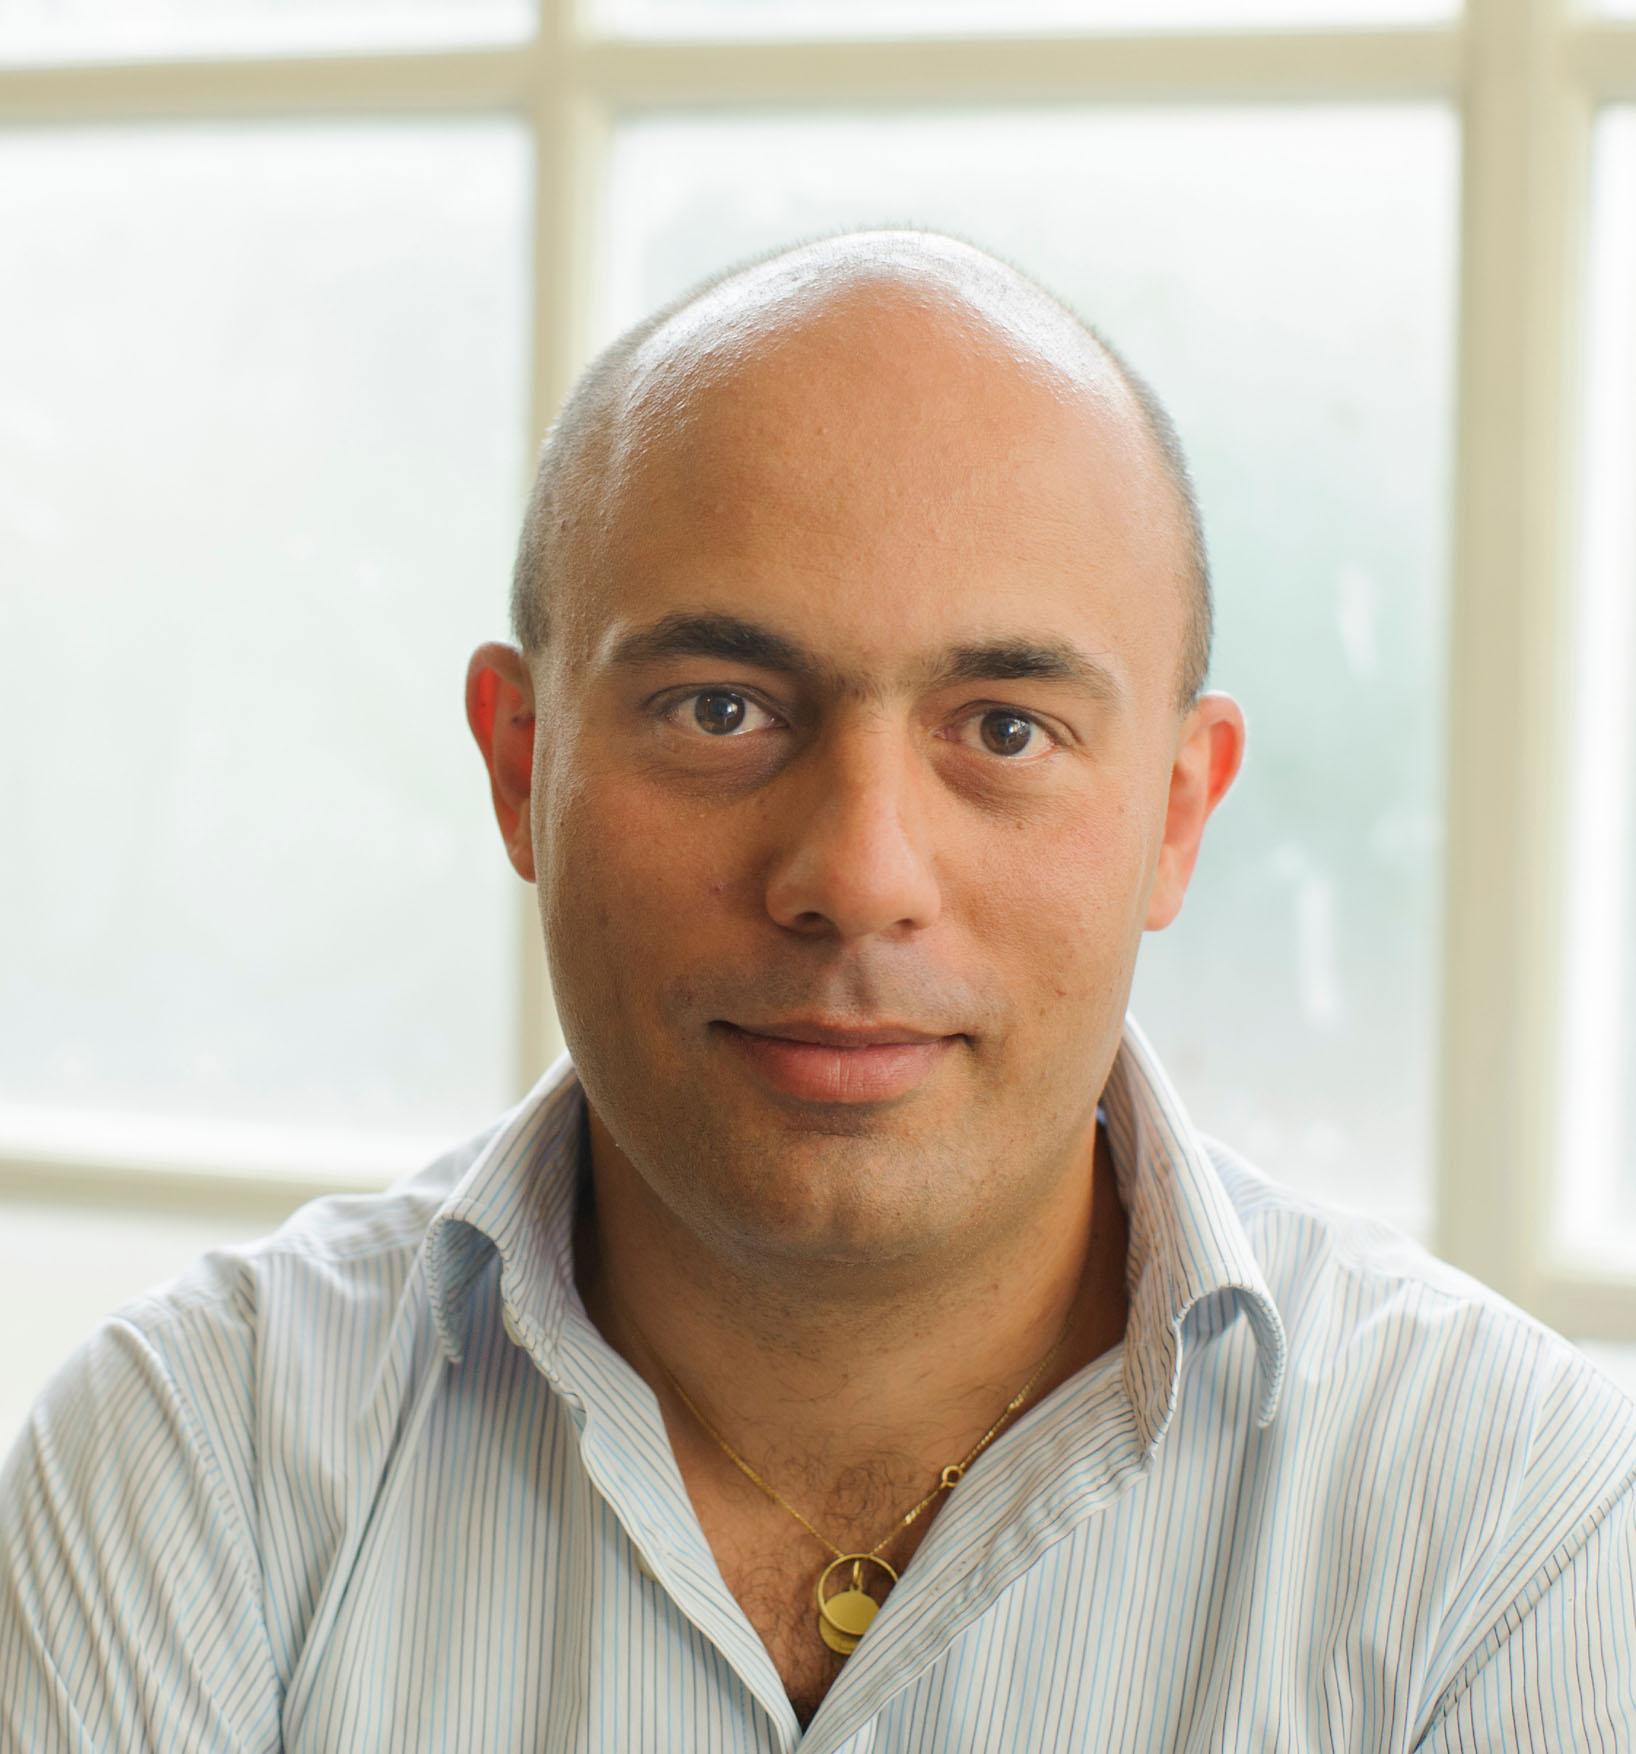 Emanuele Galloni